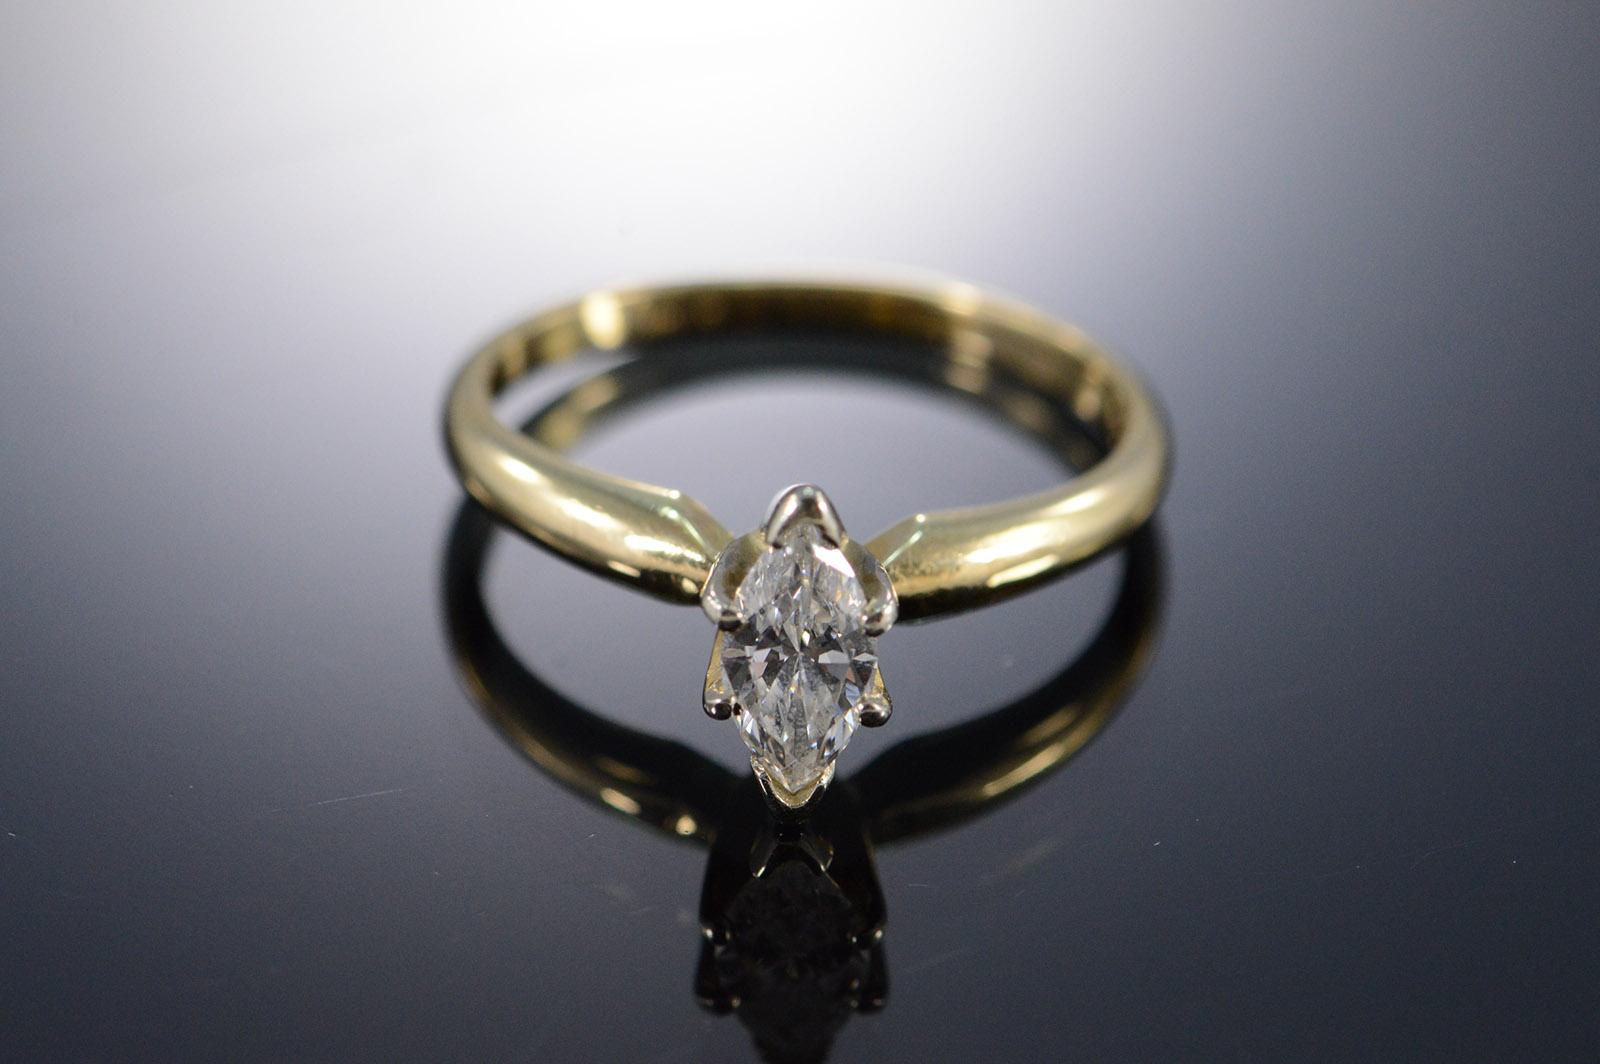 14k Egl 0 50 Ct Marquise F G Vs2 Solitaire Diamond